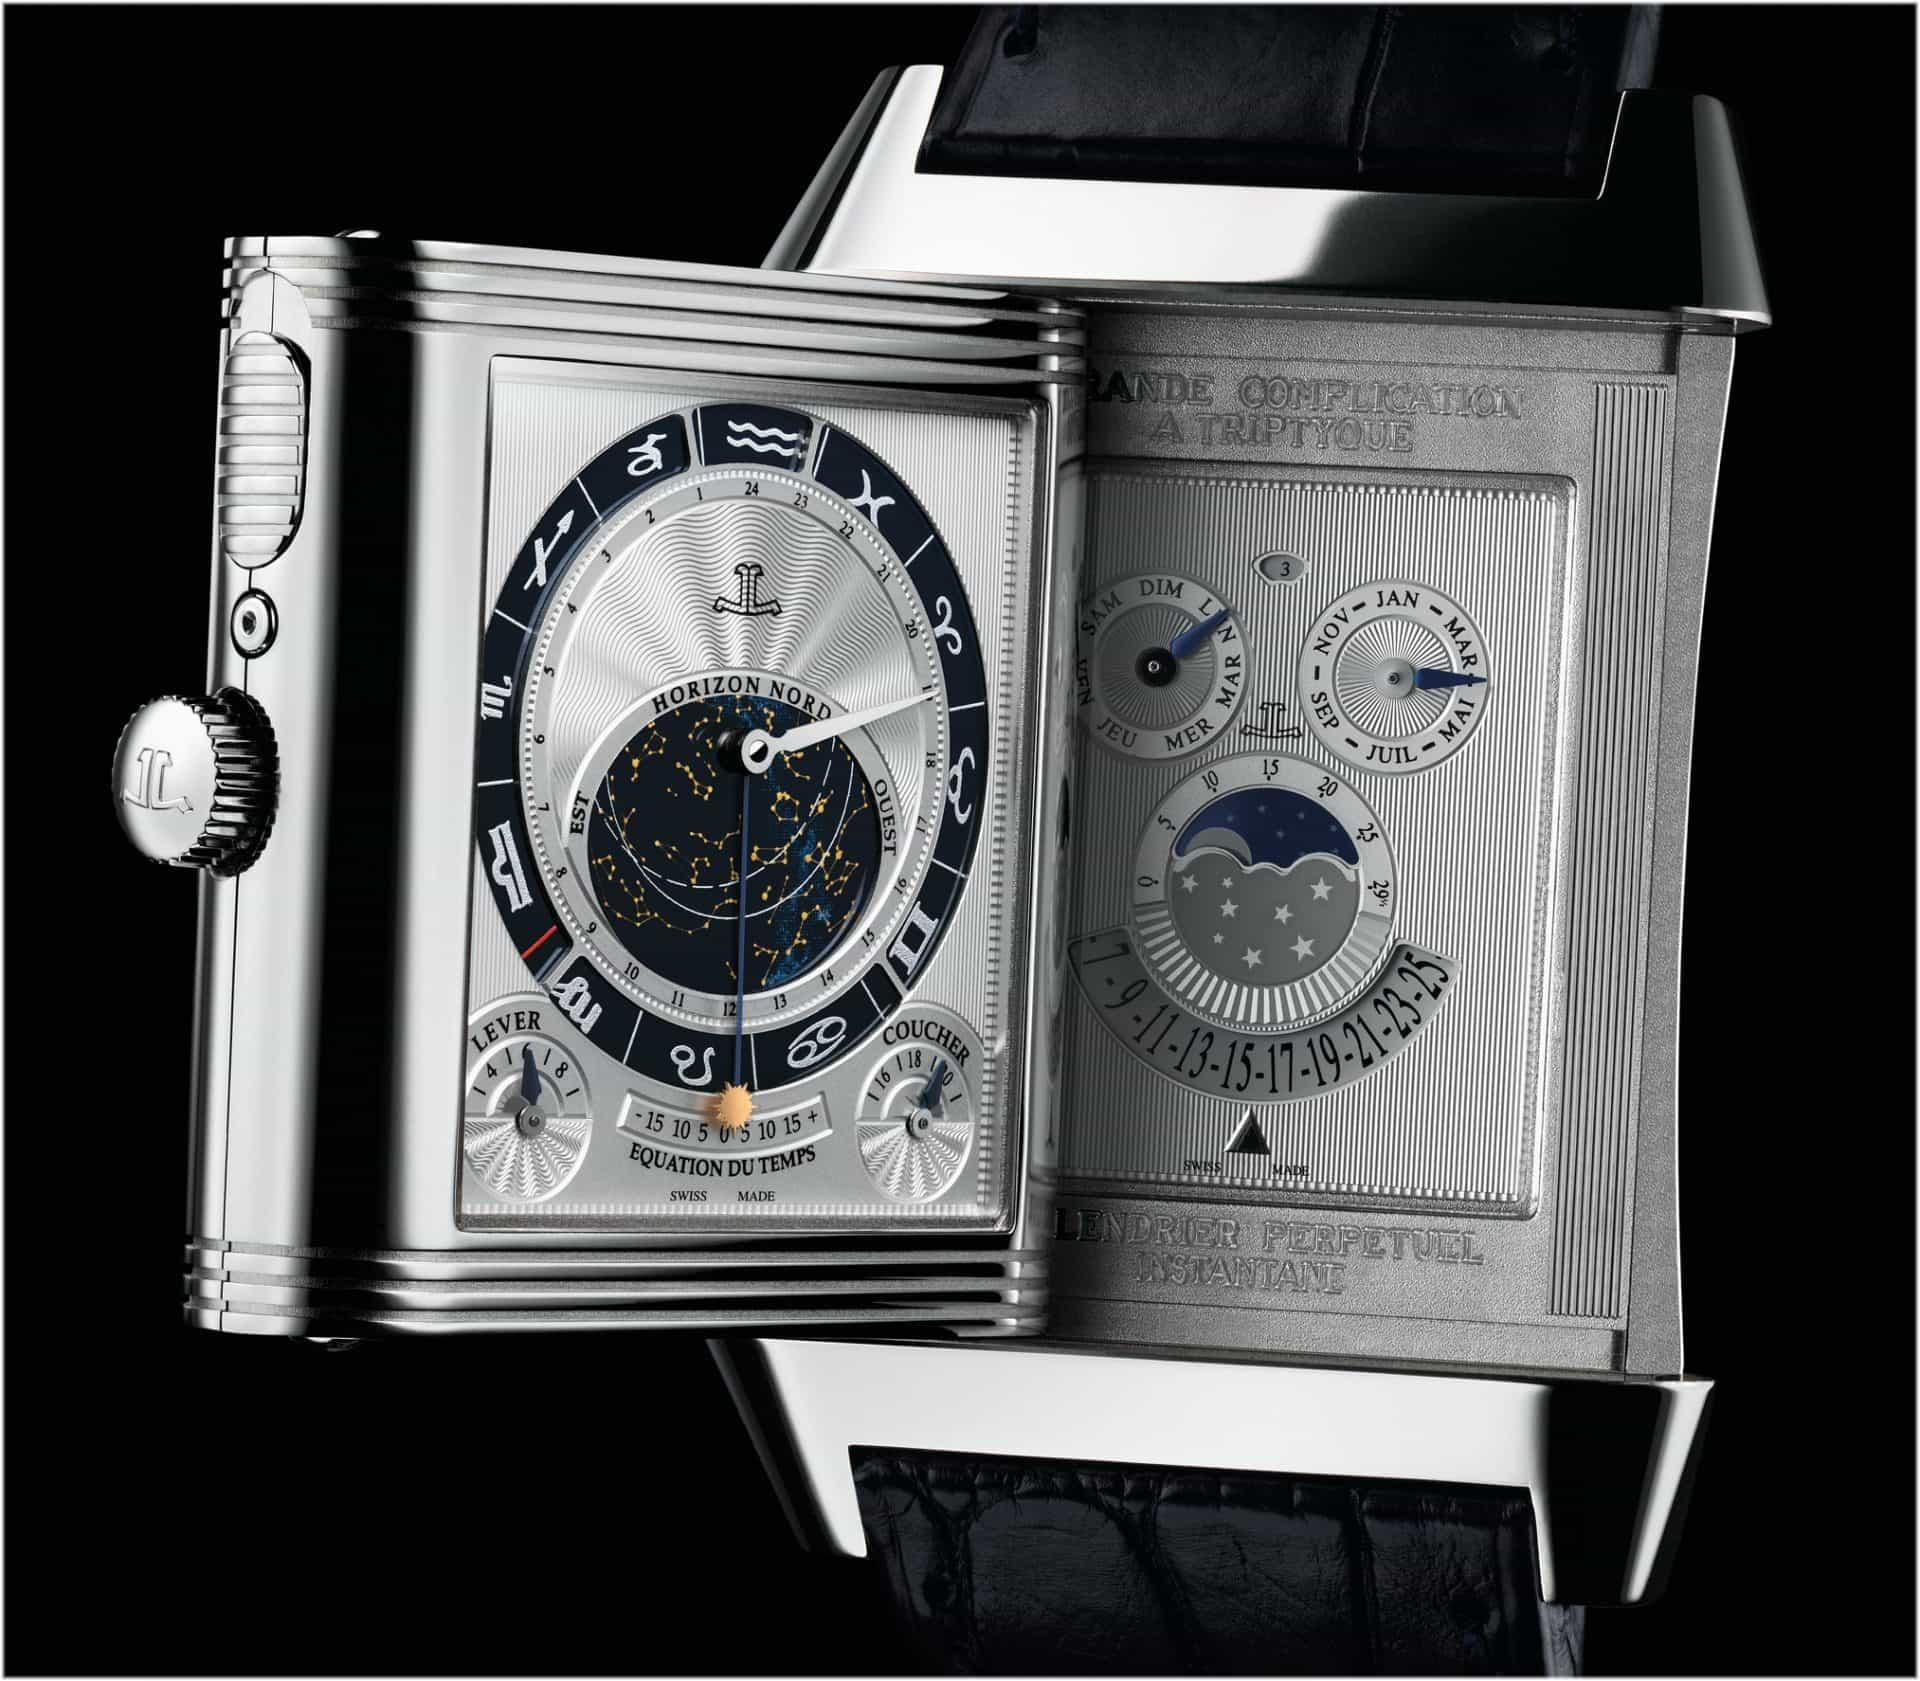 Zwei der drei Zifferblätter  der Jaeger-LeCoultre Reverso Uhr Grande Complication à Triptyque